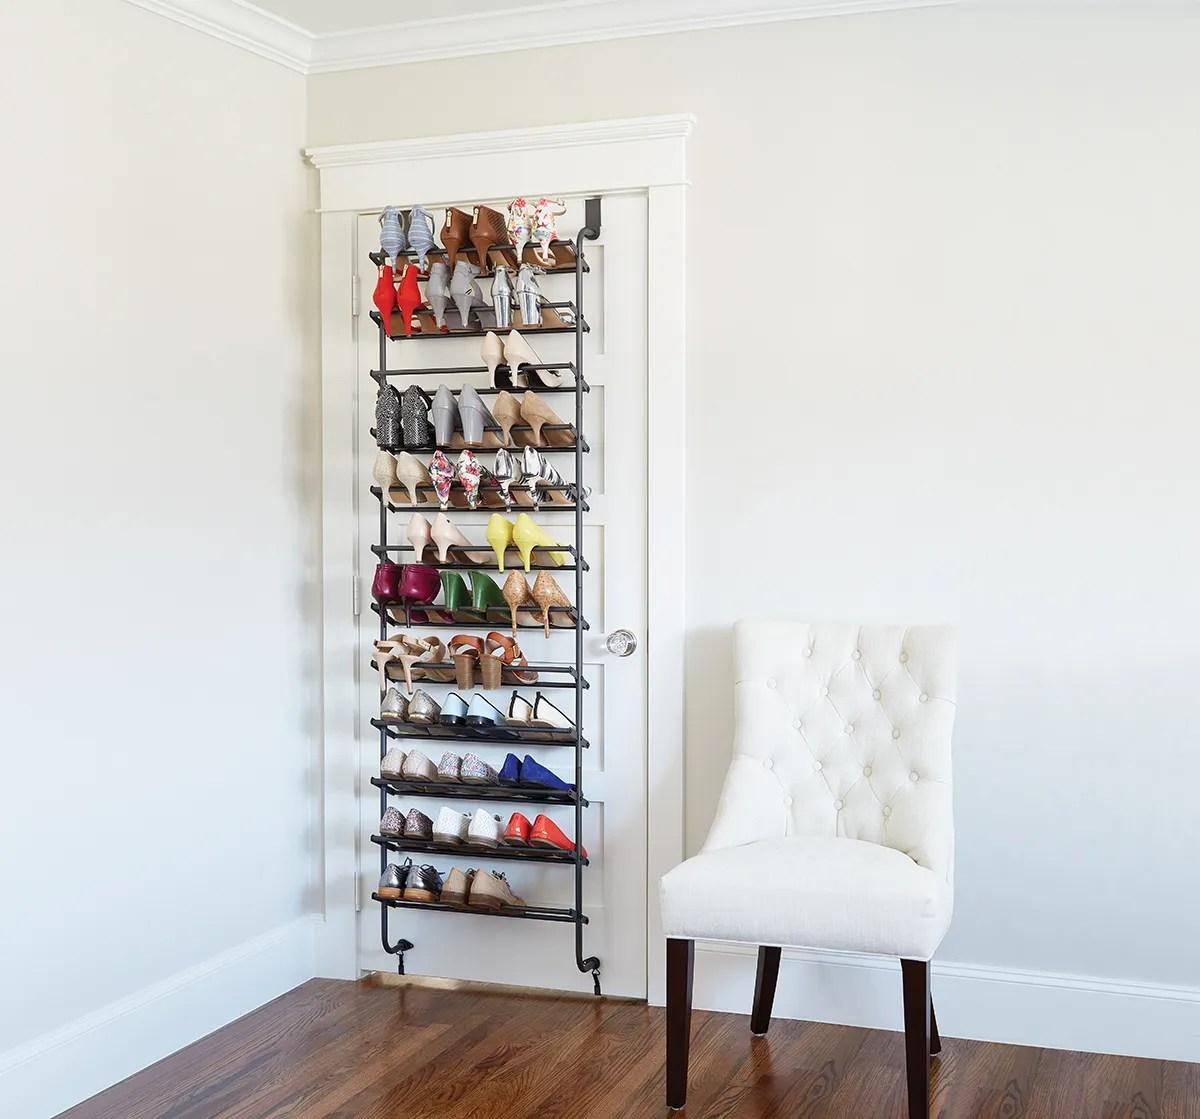 8 shoe storage ideas how to organize